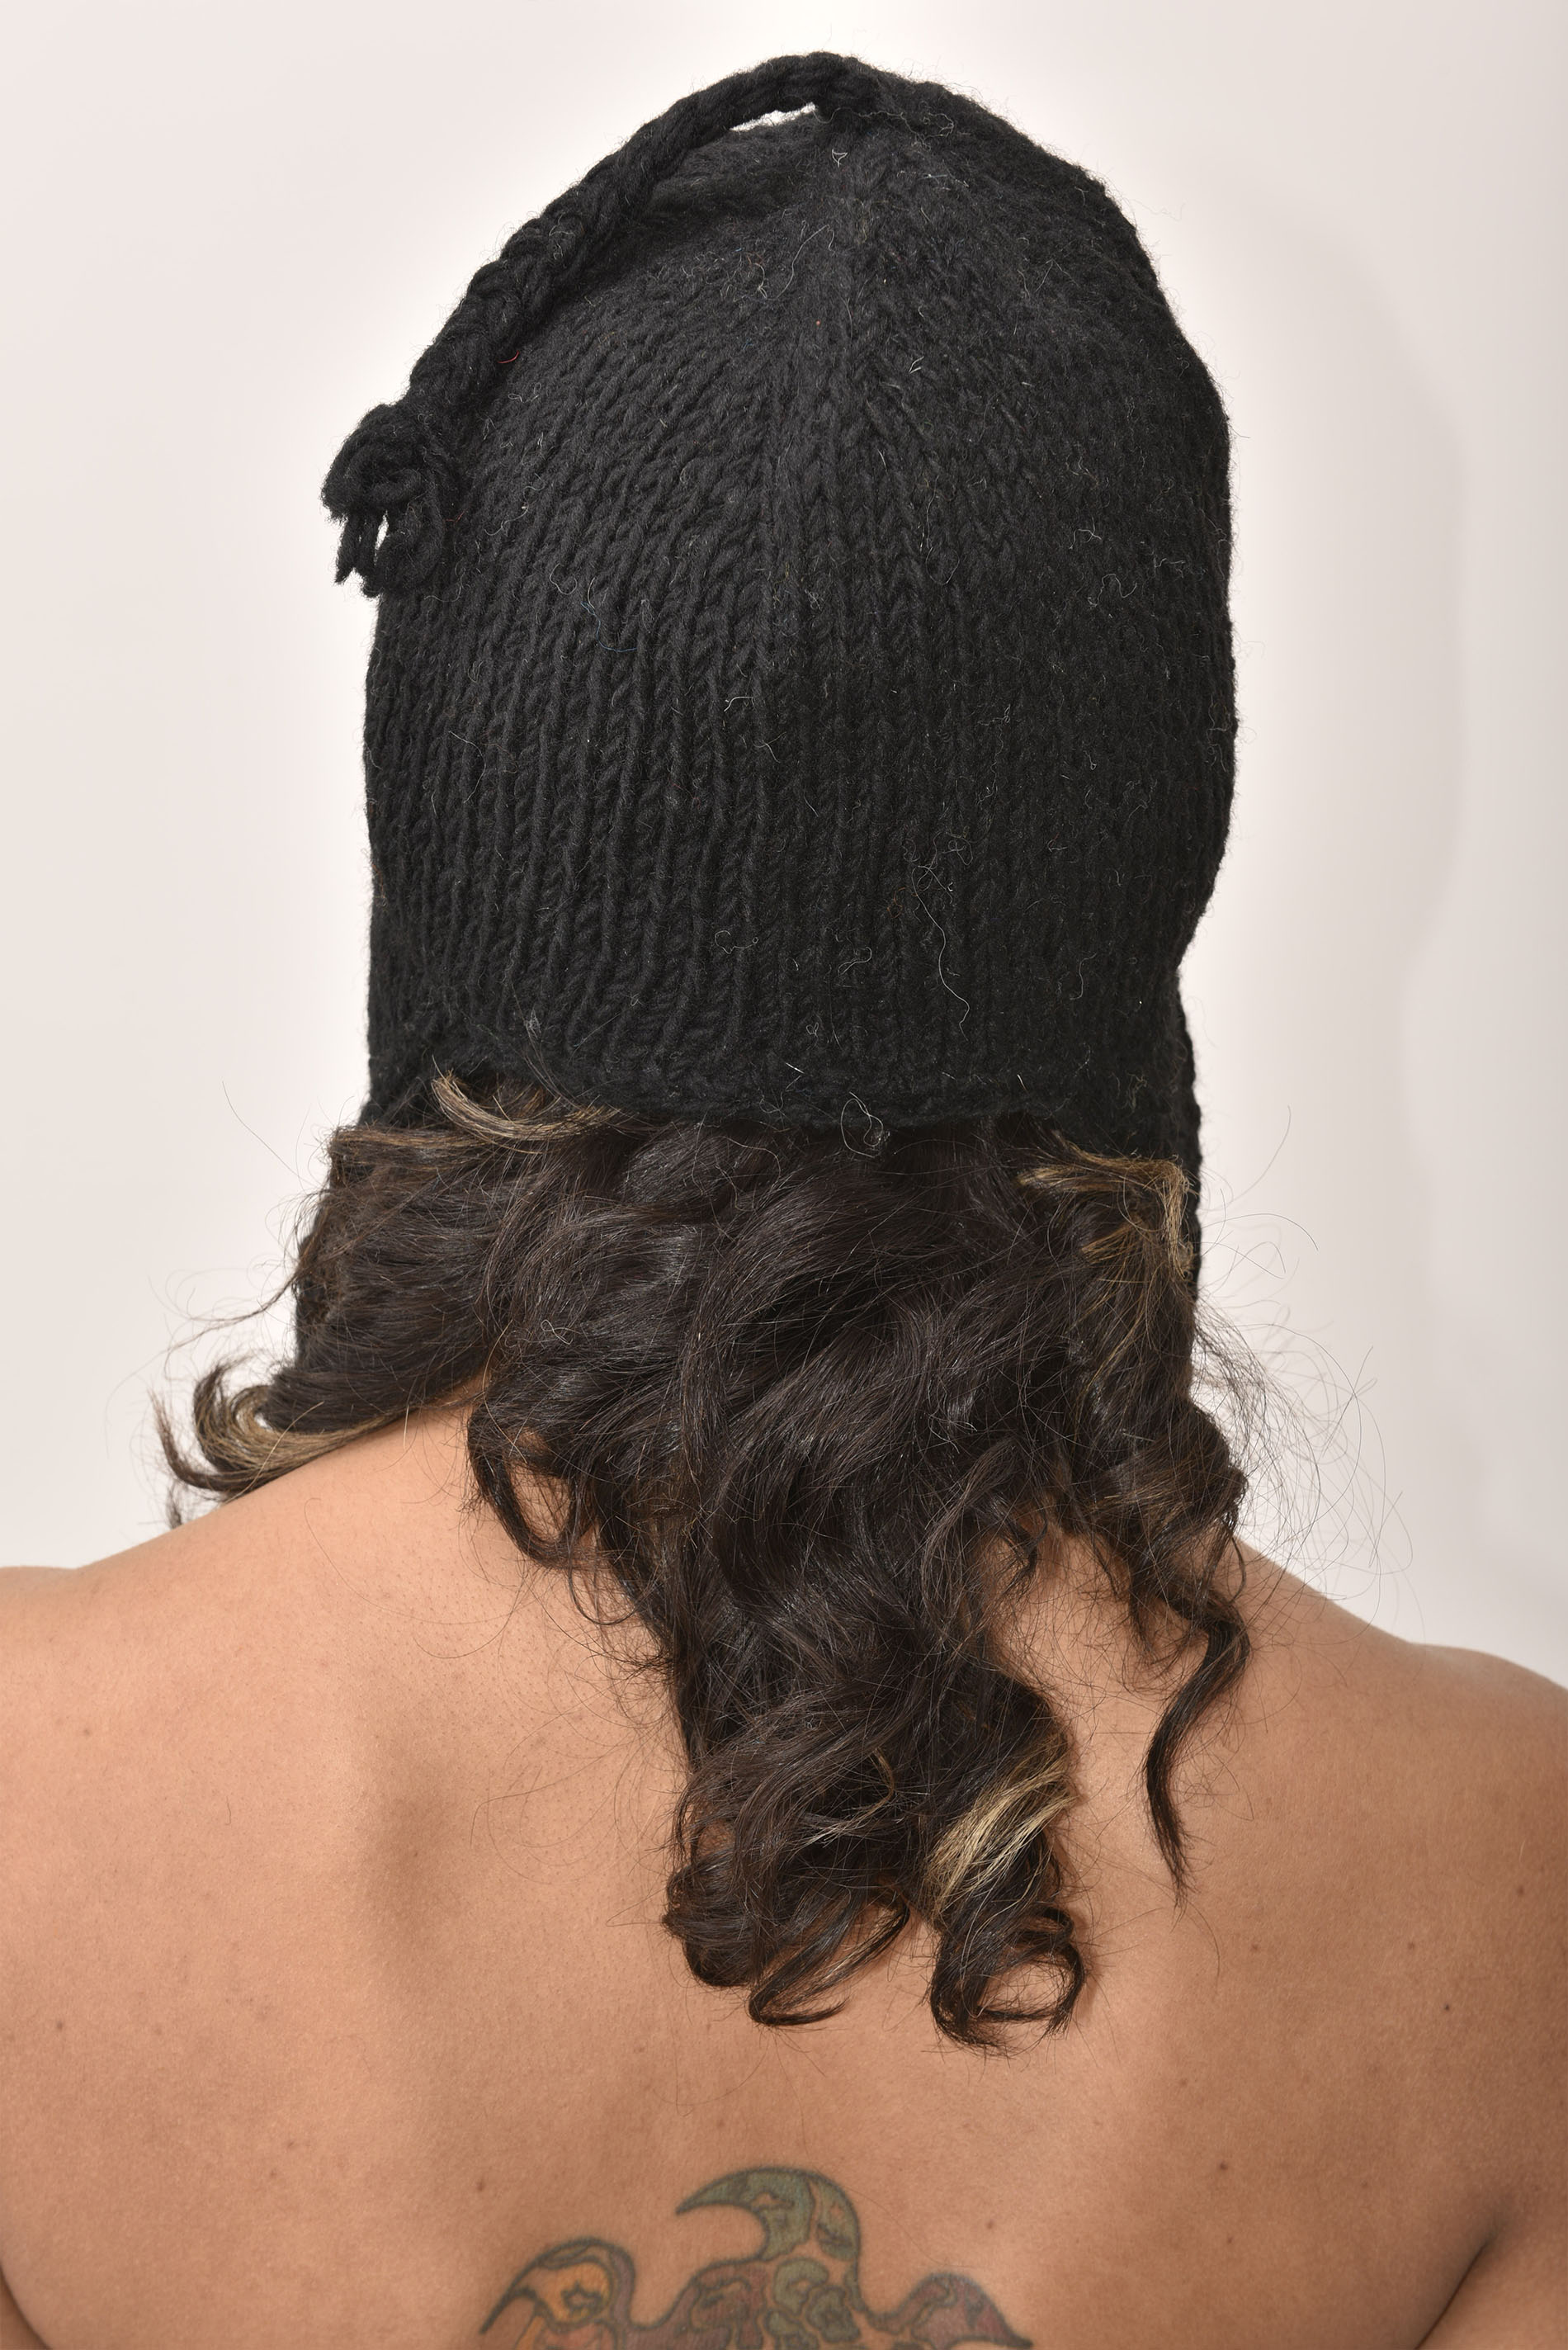 More Wool Sherpa Hats